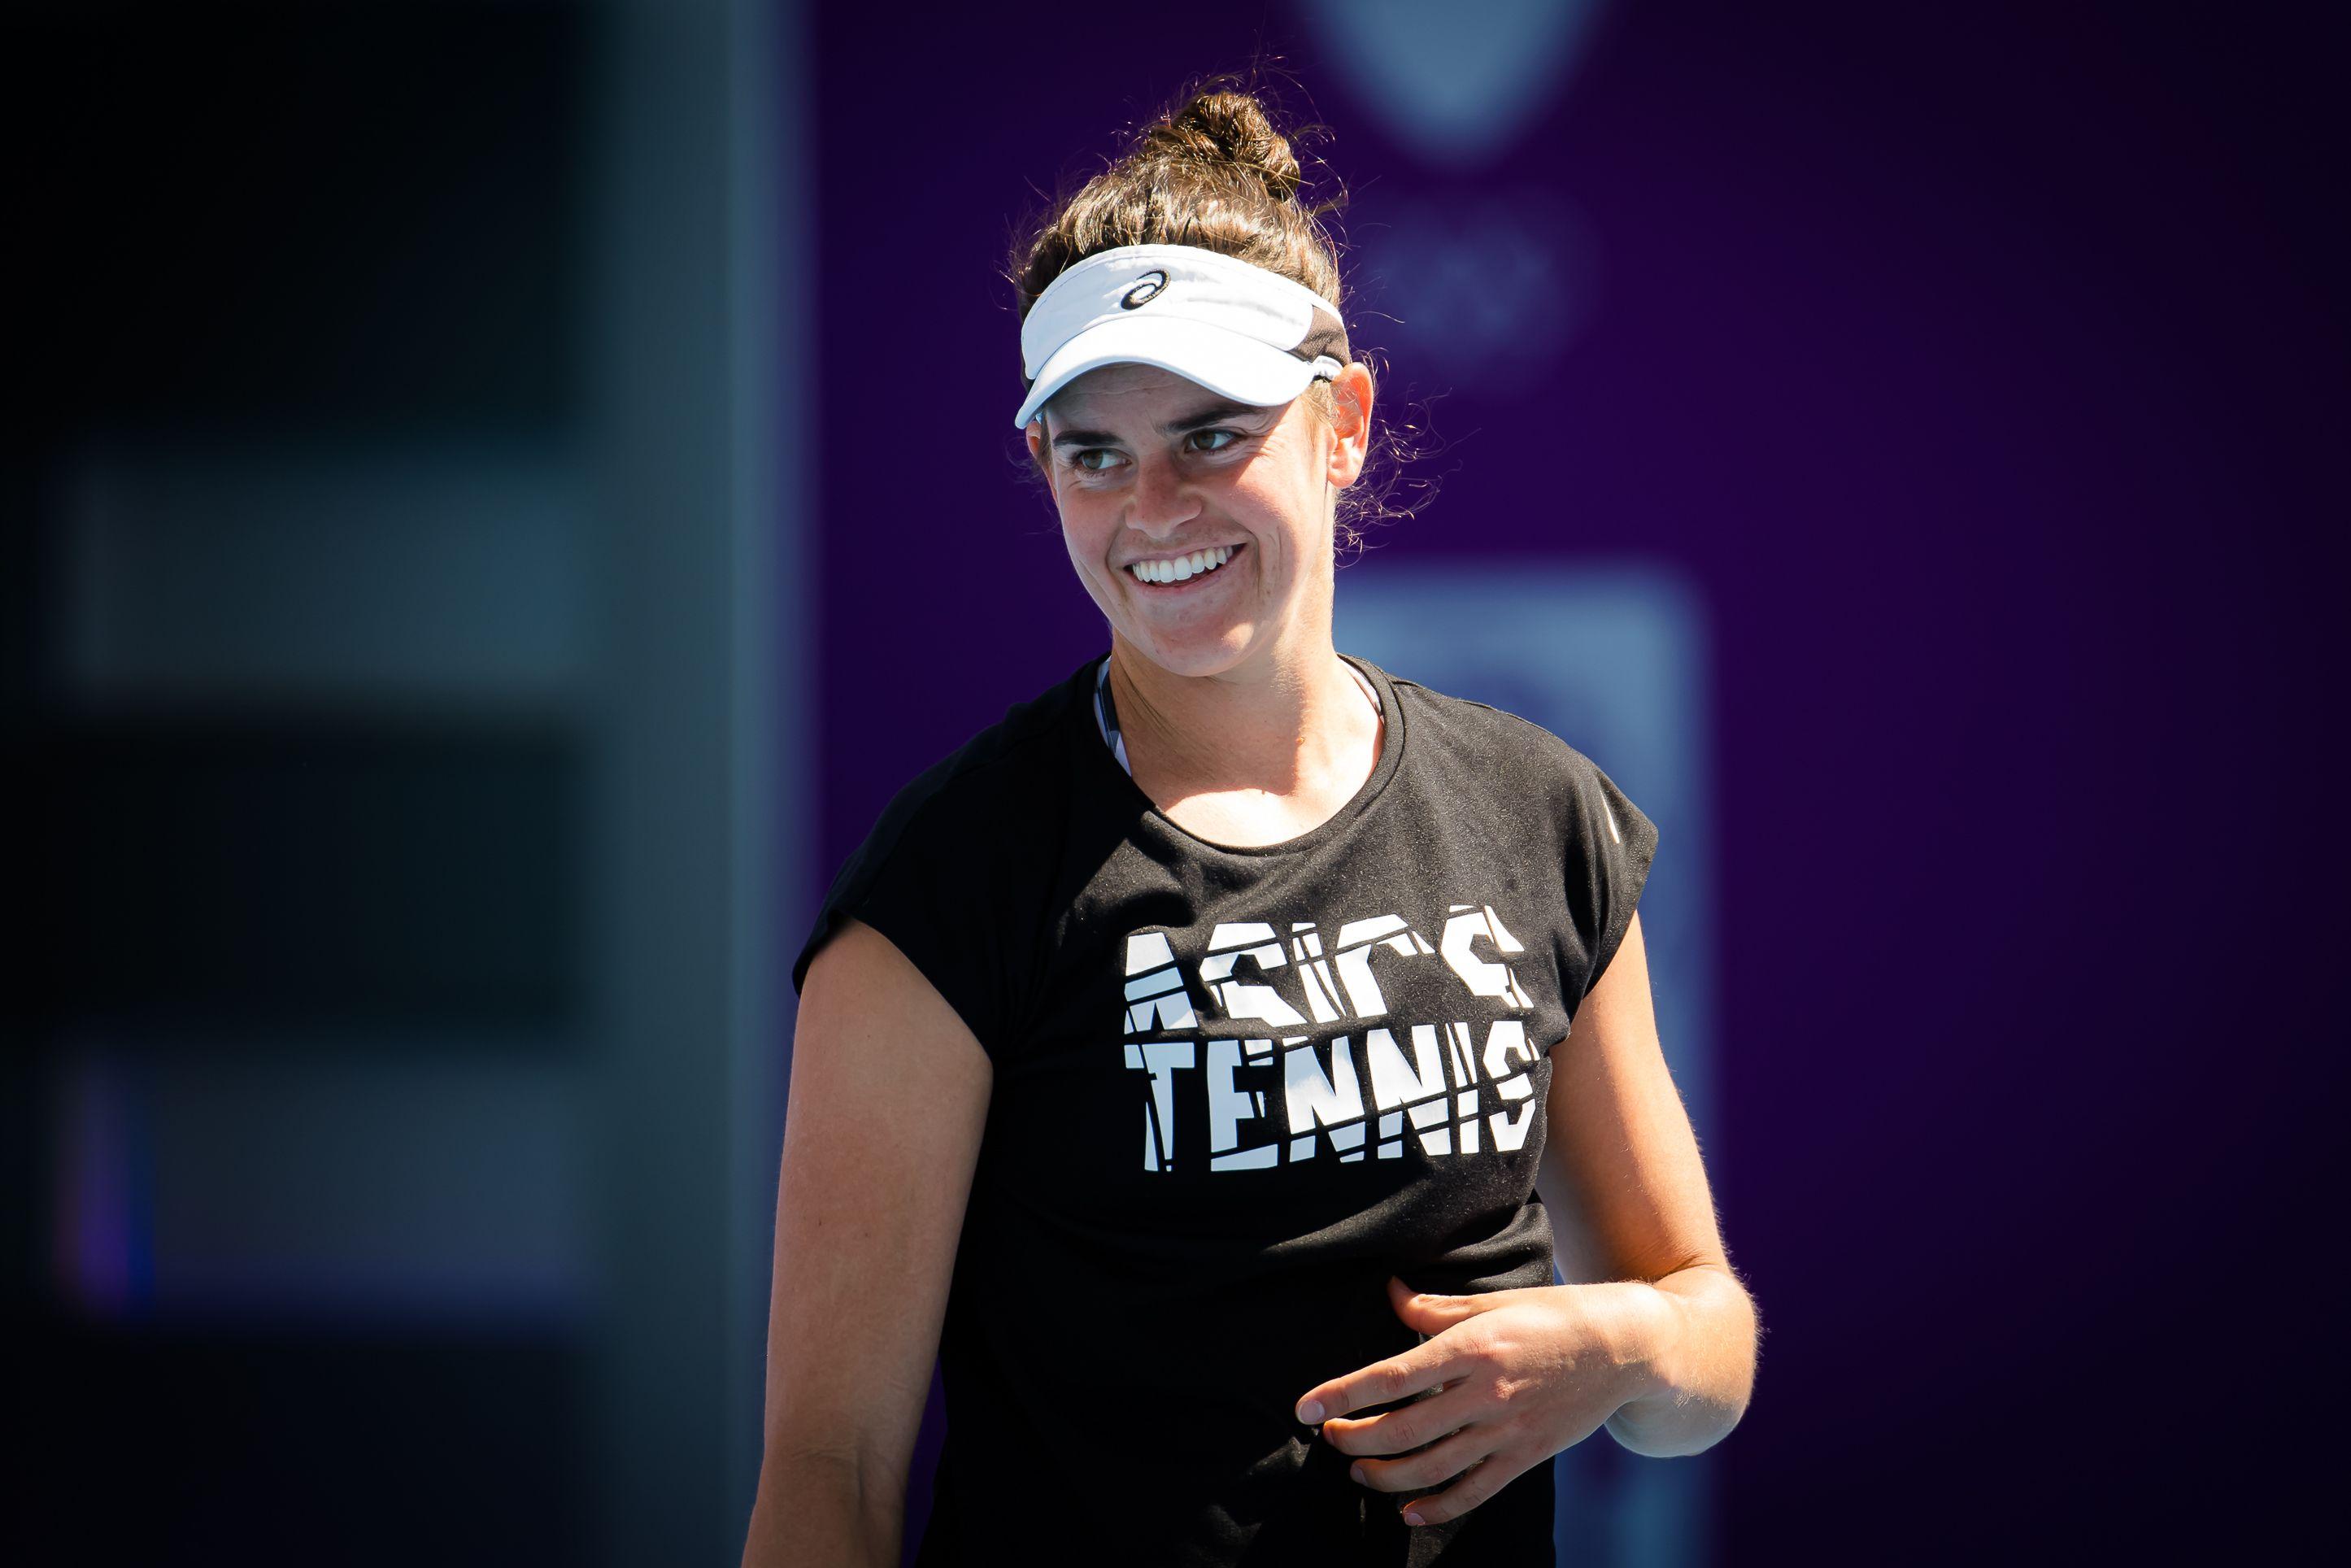 Финалистка Australian Open Брэйди проиграла на старте турнира в Дохе